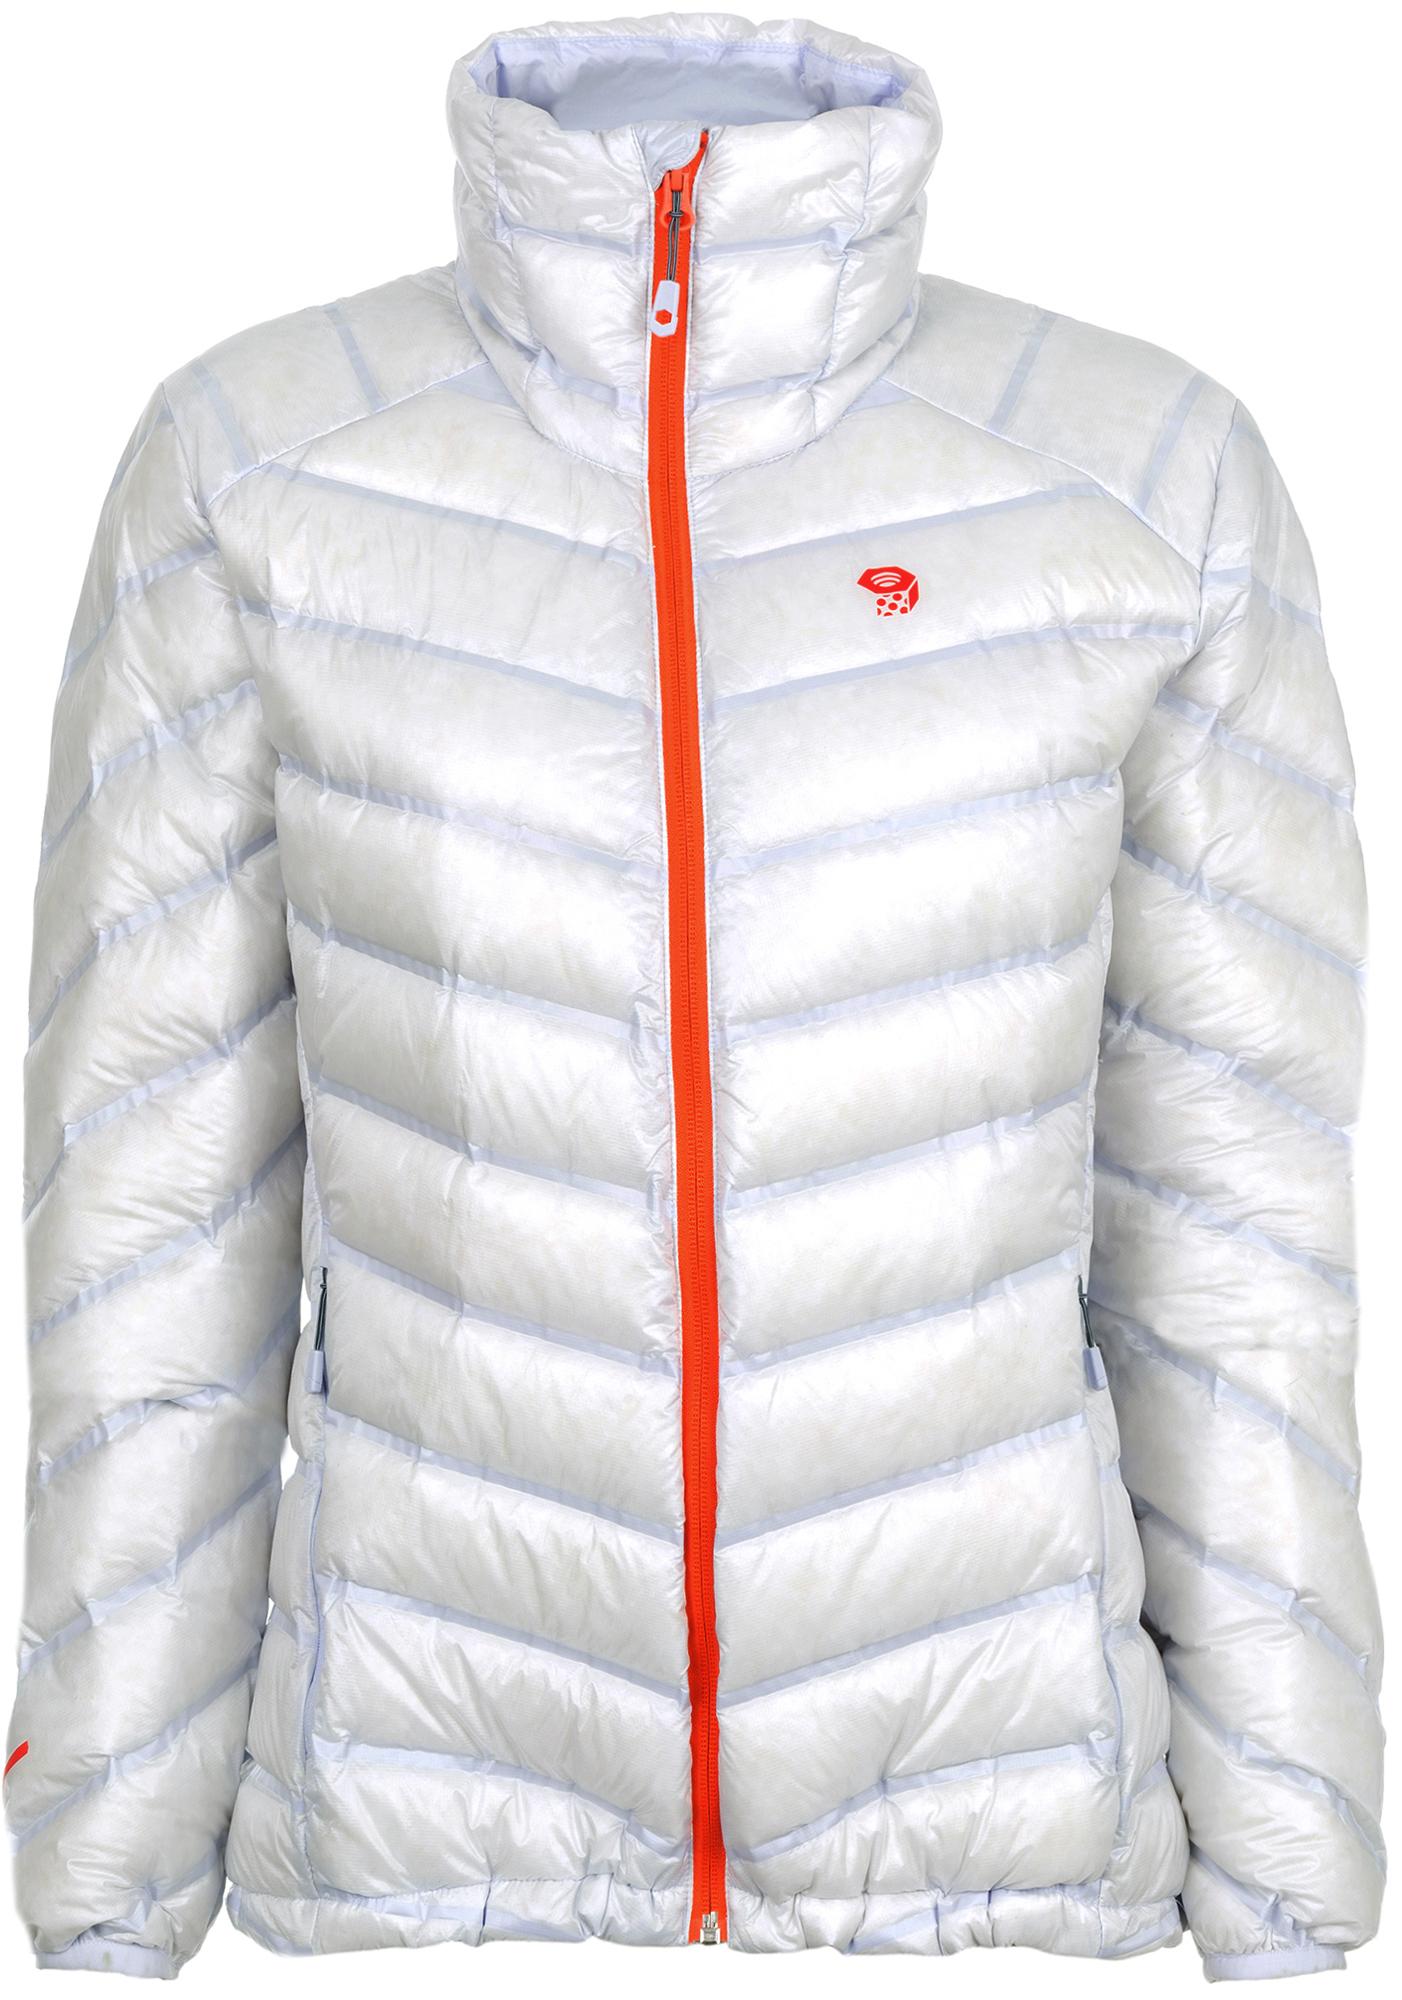 Mountain Hardwear Куртка пуховая женская Mountain Hardwear StretchDown, размер 50 pajar куртка пуховая женская cougar xl jet black